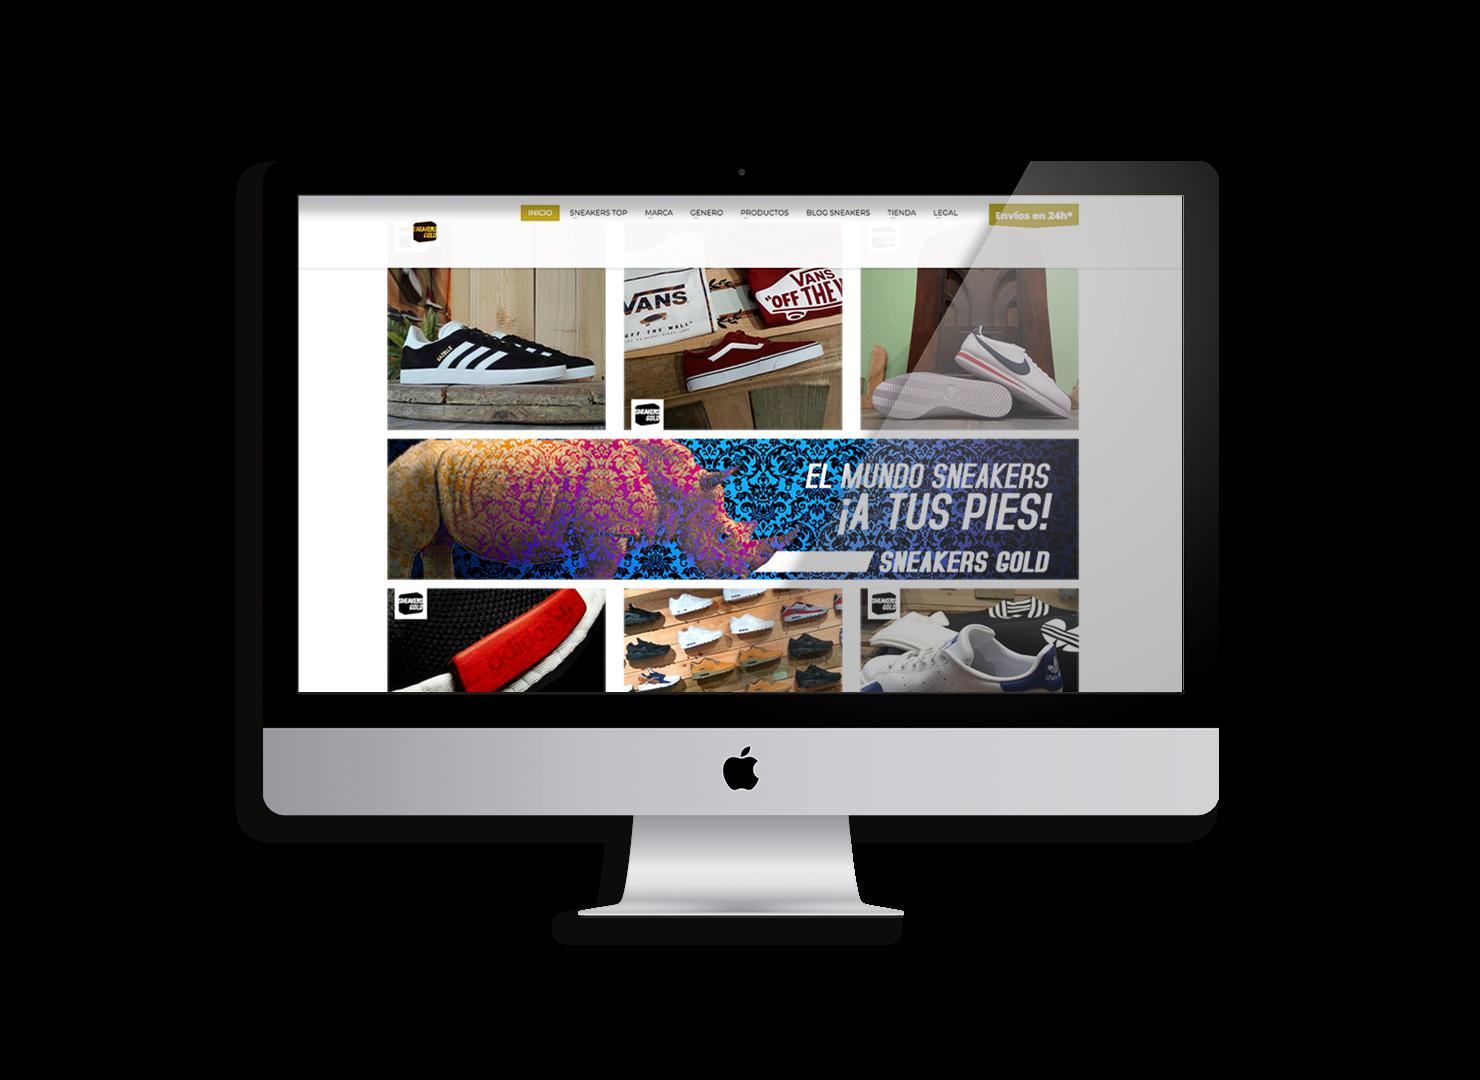 SneakersGold casosdeexito 1.jpg - Sneakers Gold